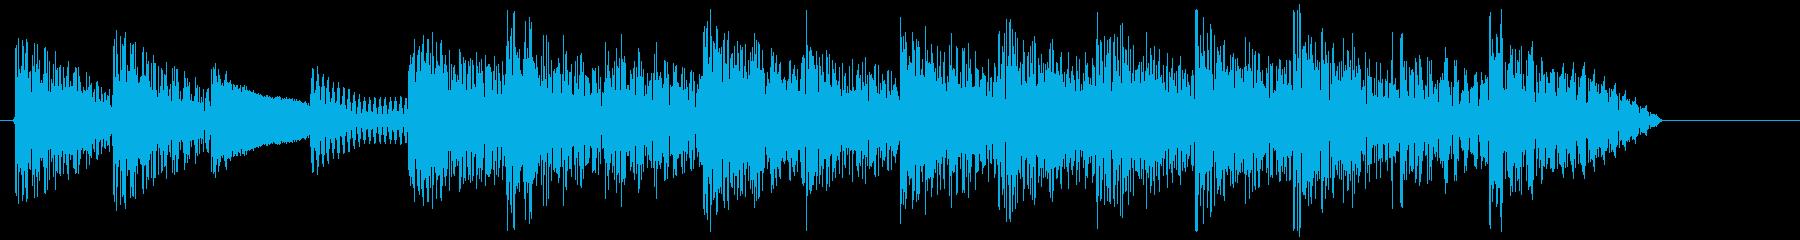 8bitジングル#4スタート&クリアの再生済みの波形